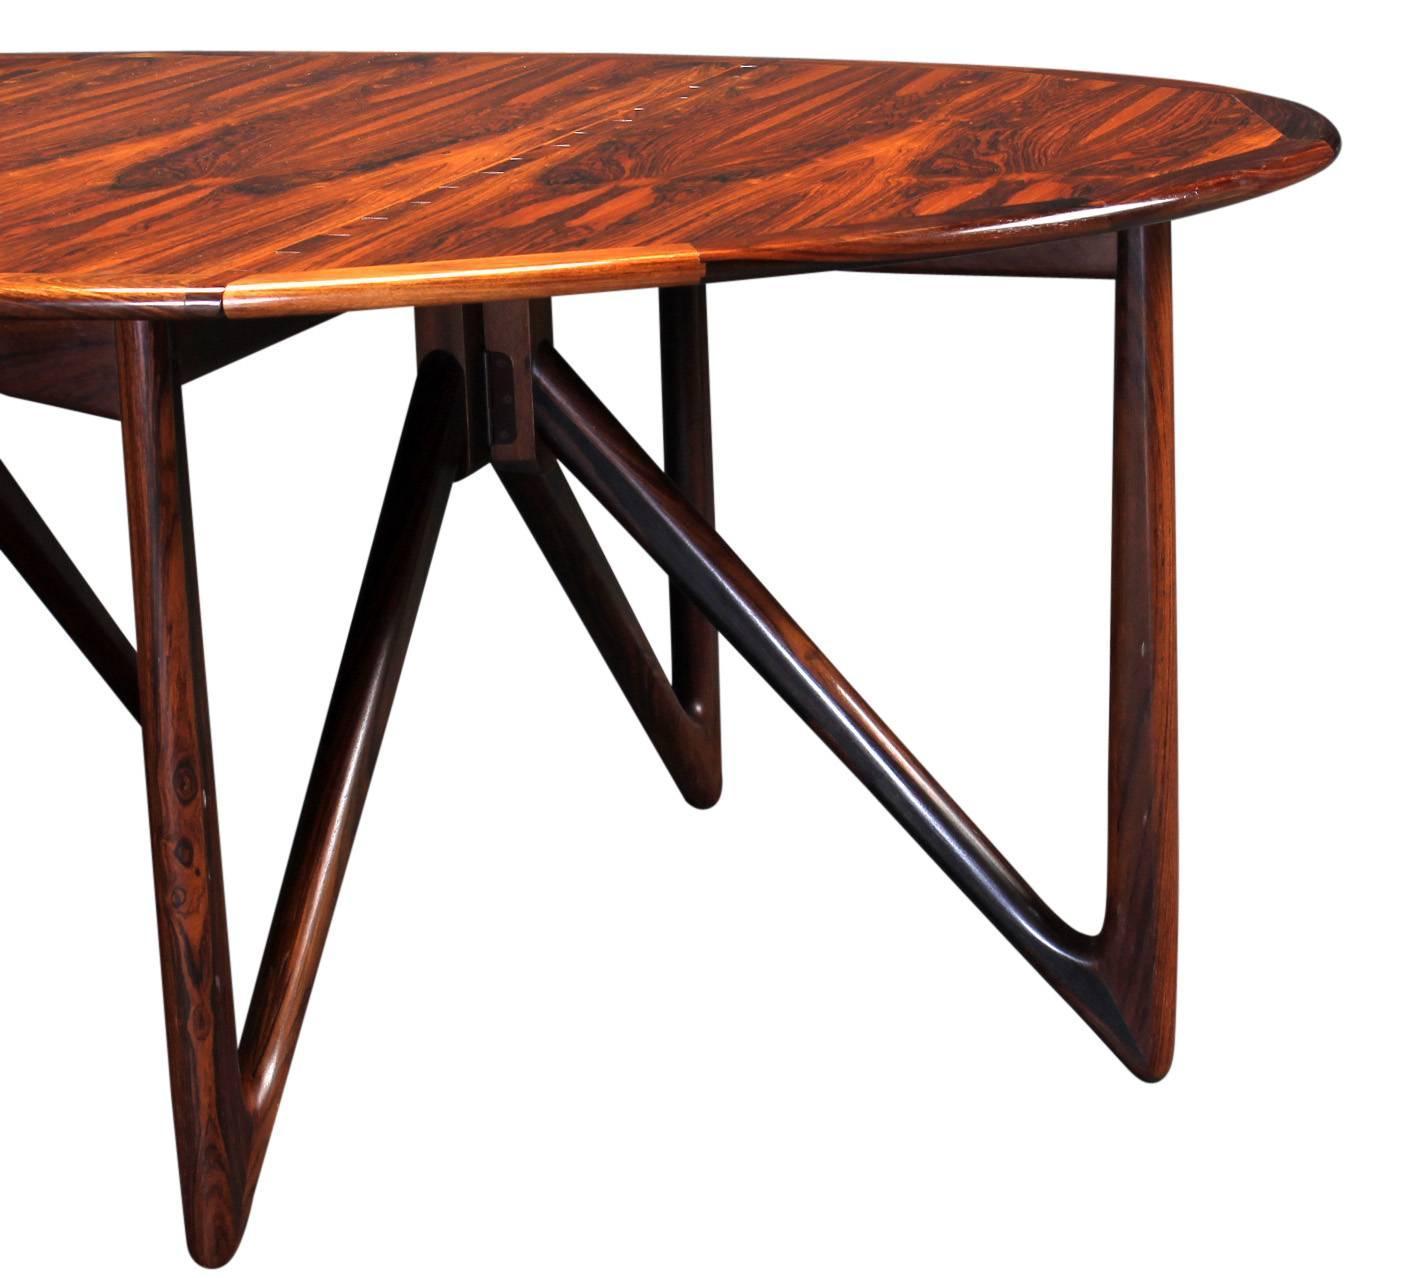 Niels Koefoed Drop Leaf Dining Table in Brazilian Rosewood  : 40986264z from www.1stdibs.com size 1424 x 1278 jpeg 99kB